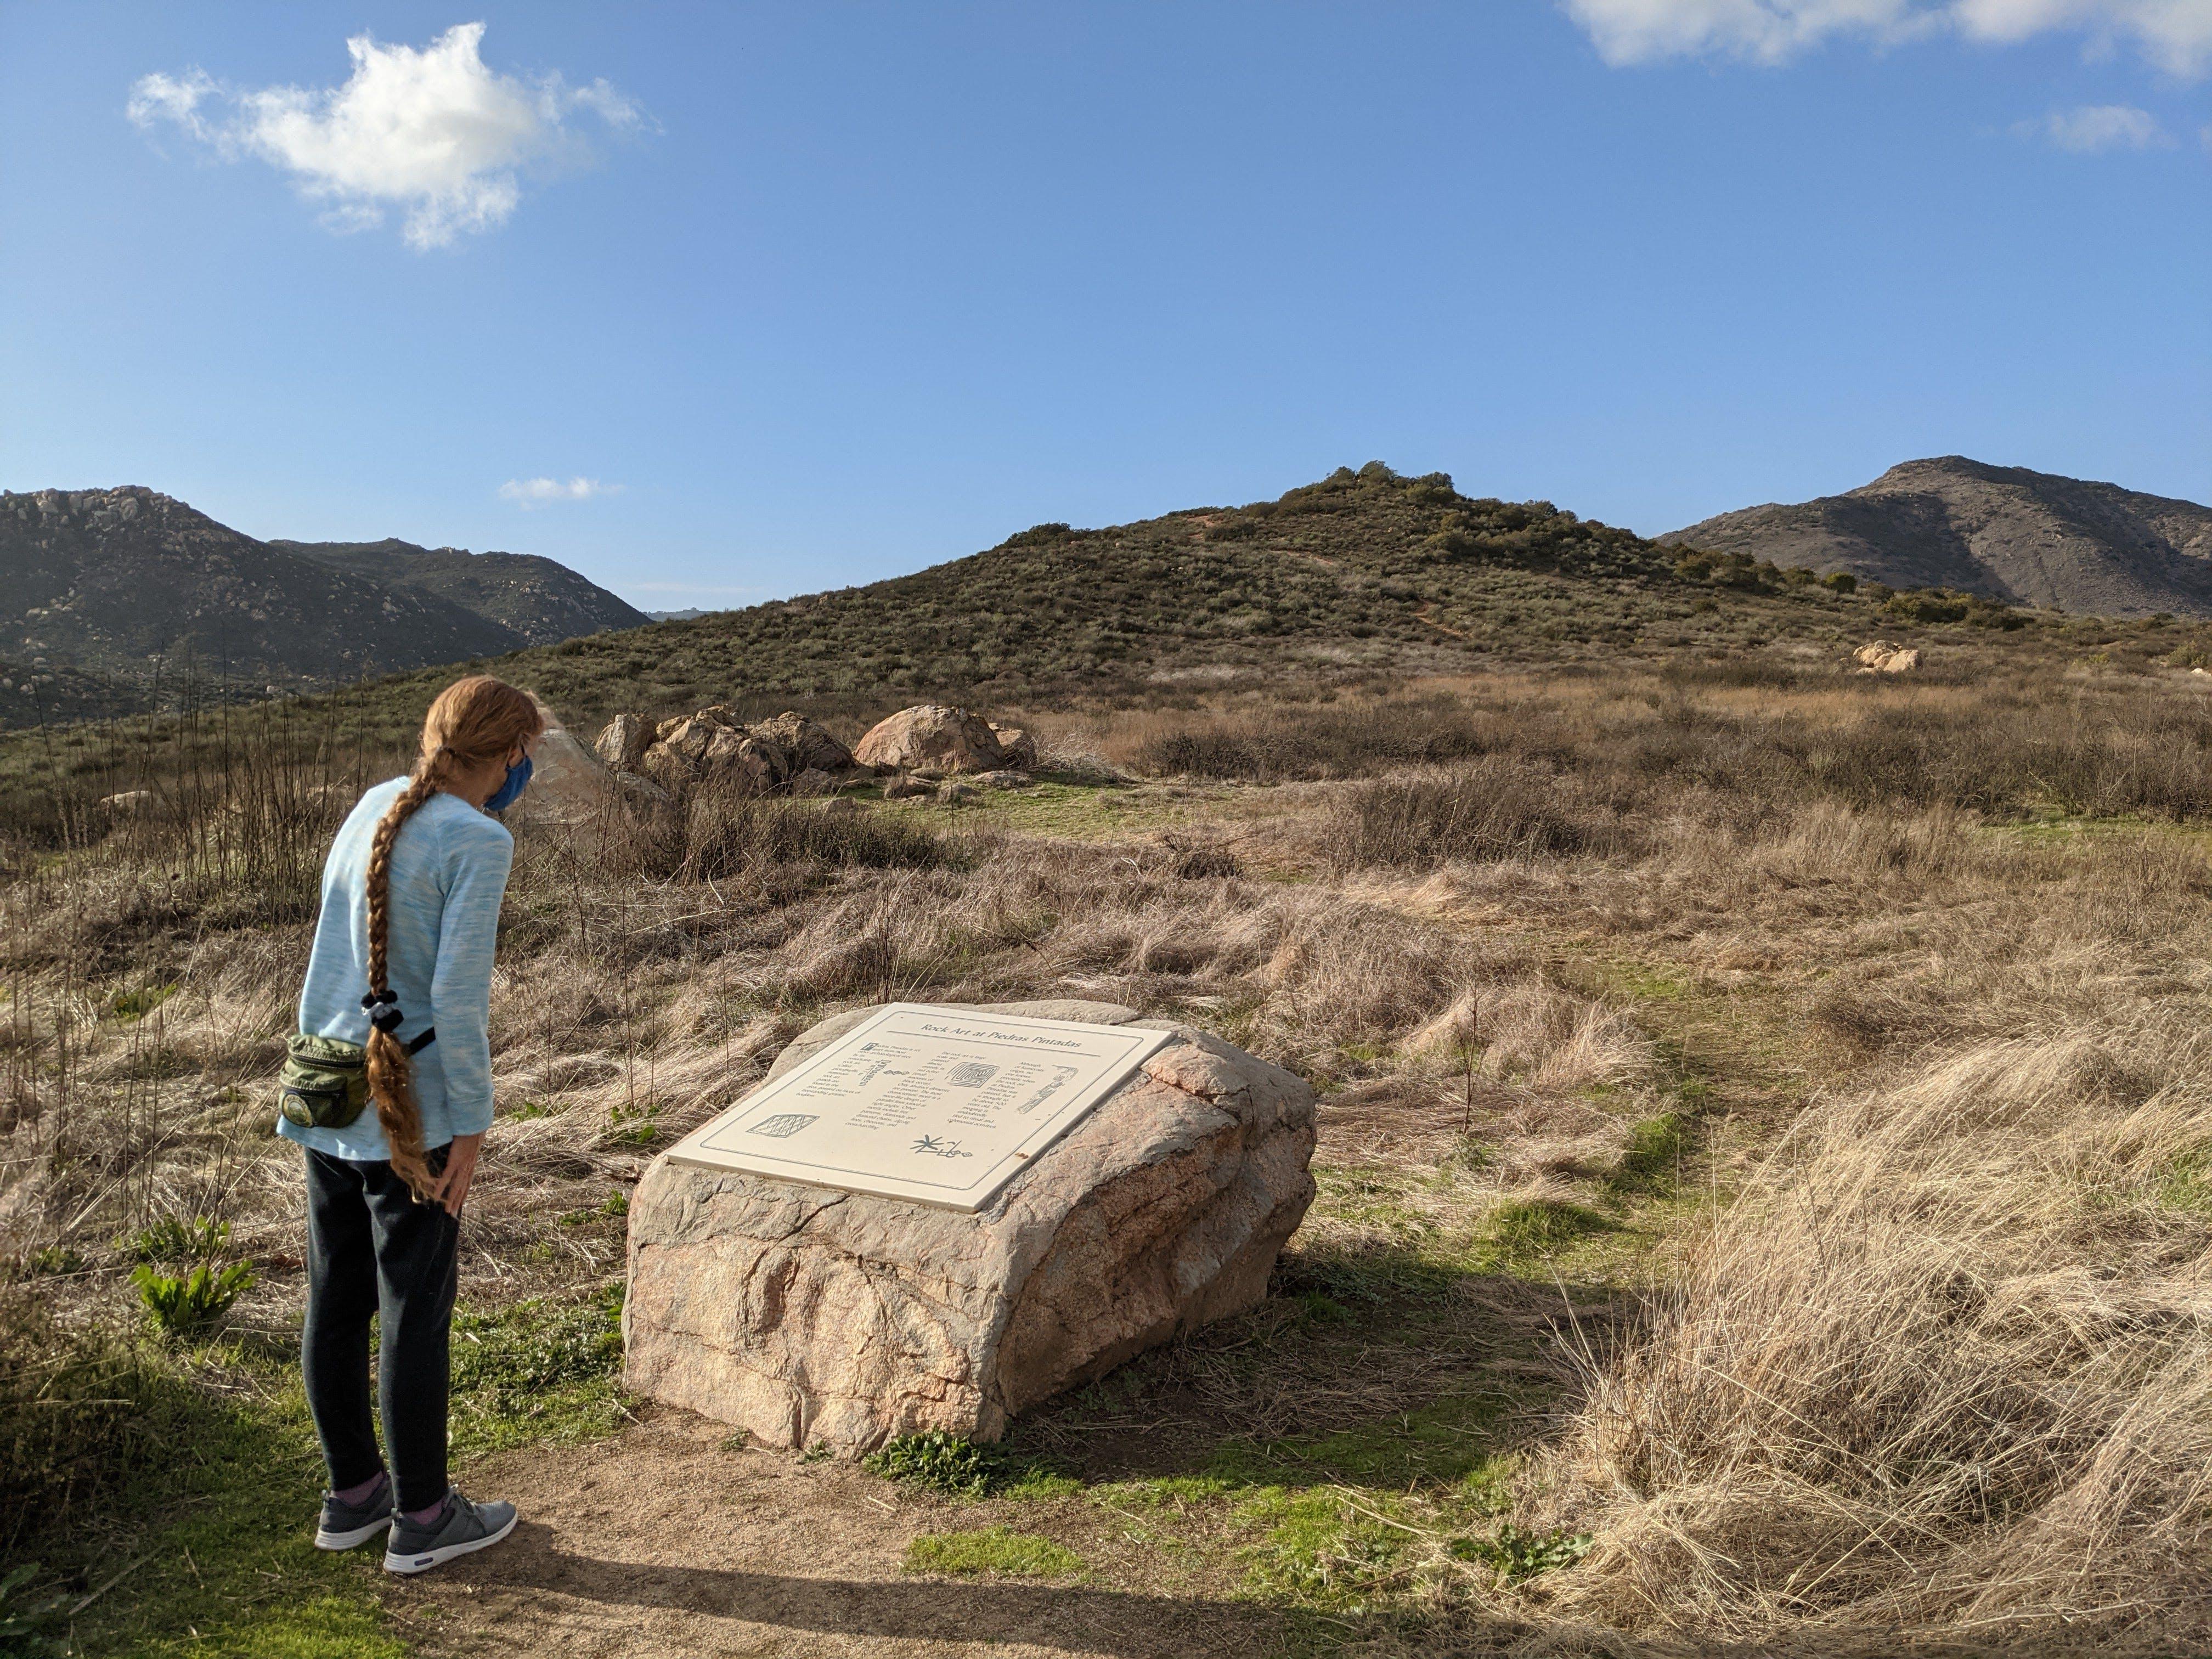 Woman looking at a placard rock sign at Lake Hodges Escondido San Diego County